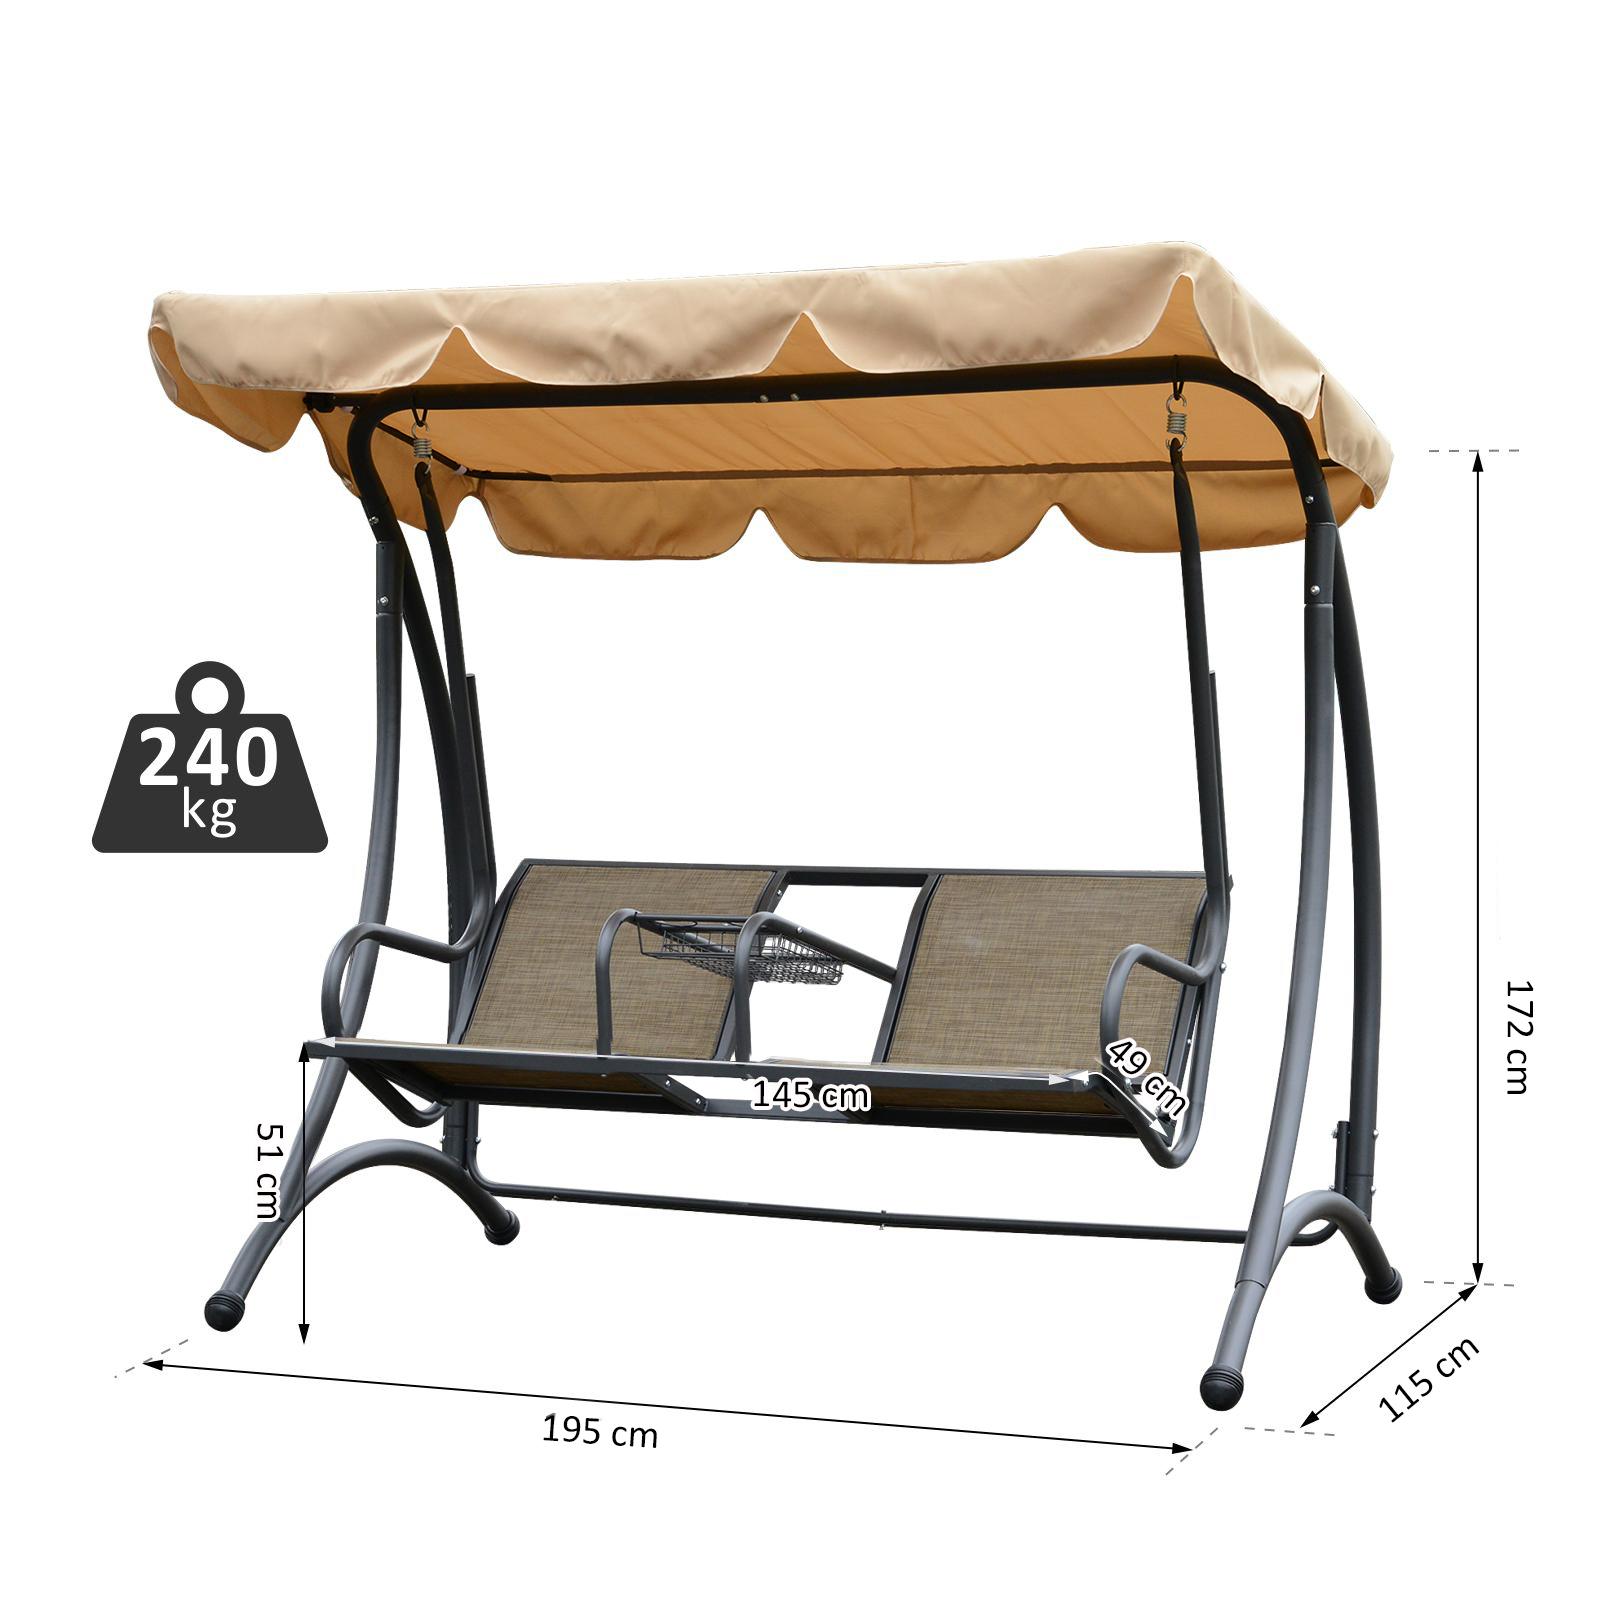 Full Size of Outsunny 2 Sitzer Hollywoodschaukel Schaukel Mit Sonnendach Regal Metall Weiß Regale Bett Wohnzimmer Gartenschaukel Metall